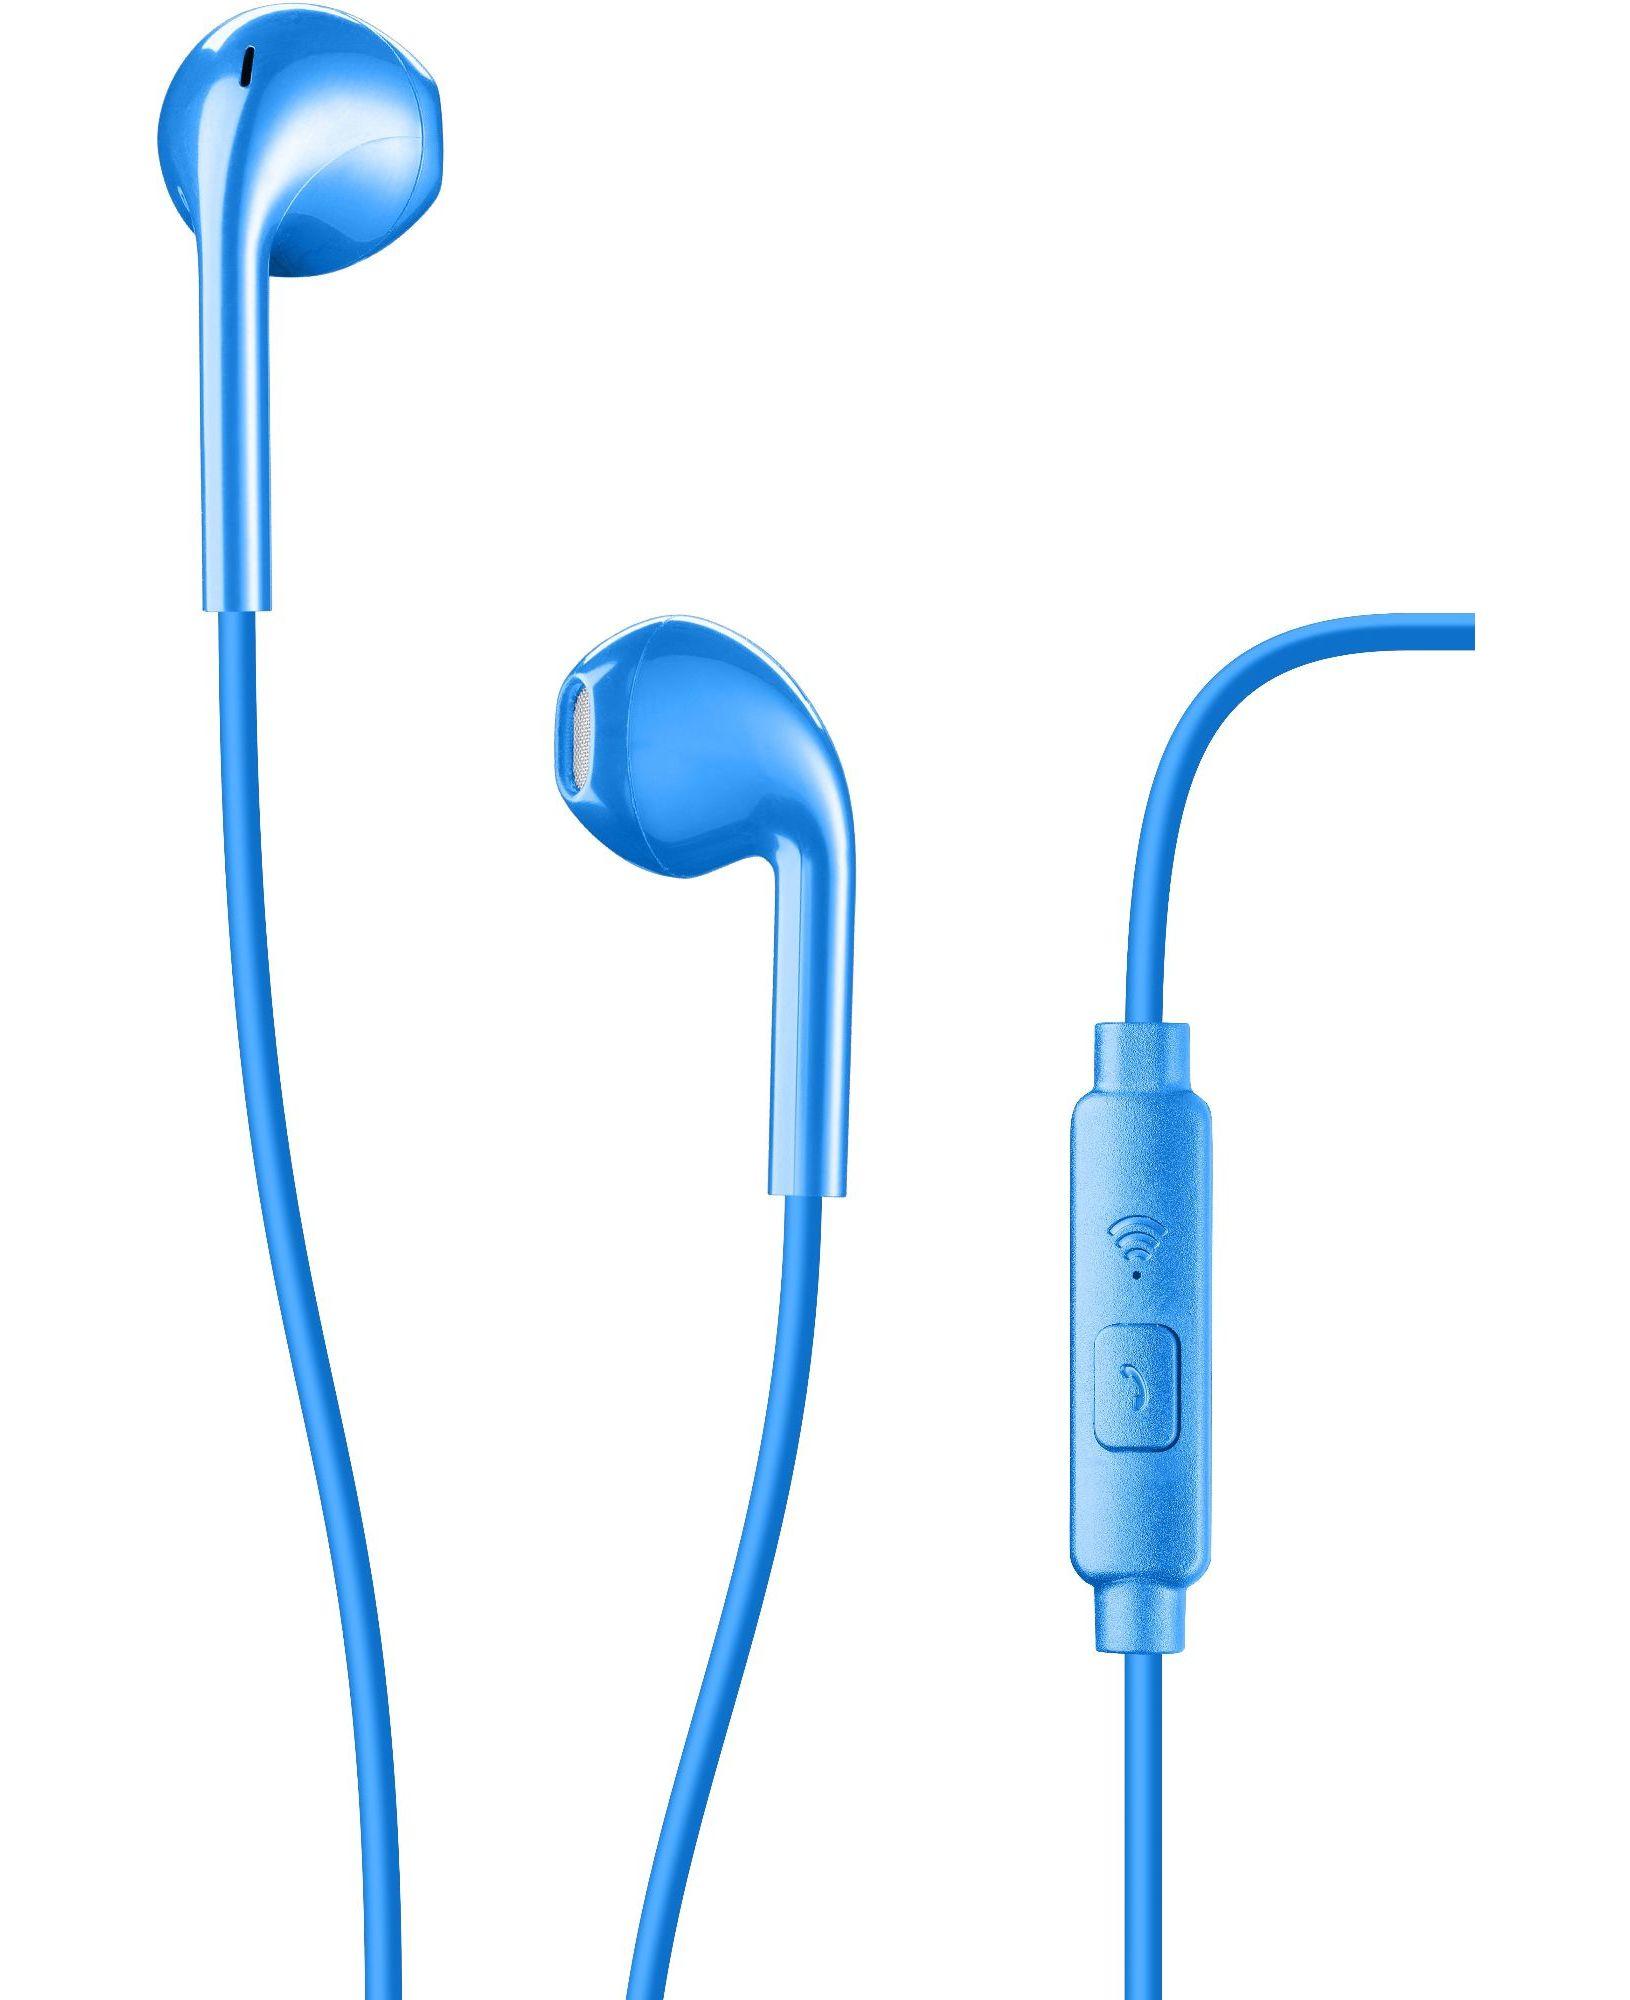 Cellularline Live - Universale Auricolare pump bass a capsula ovale Blu